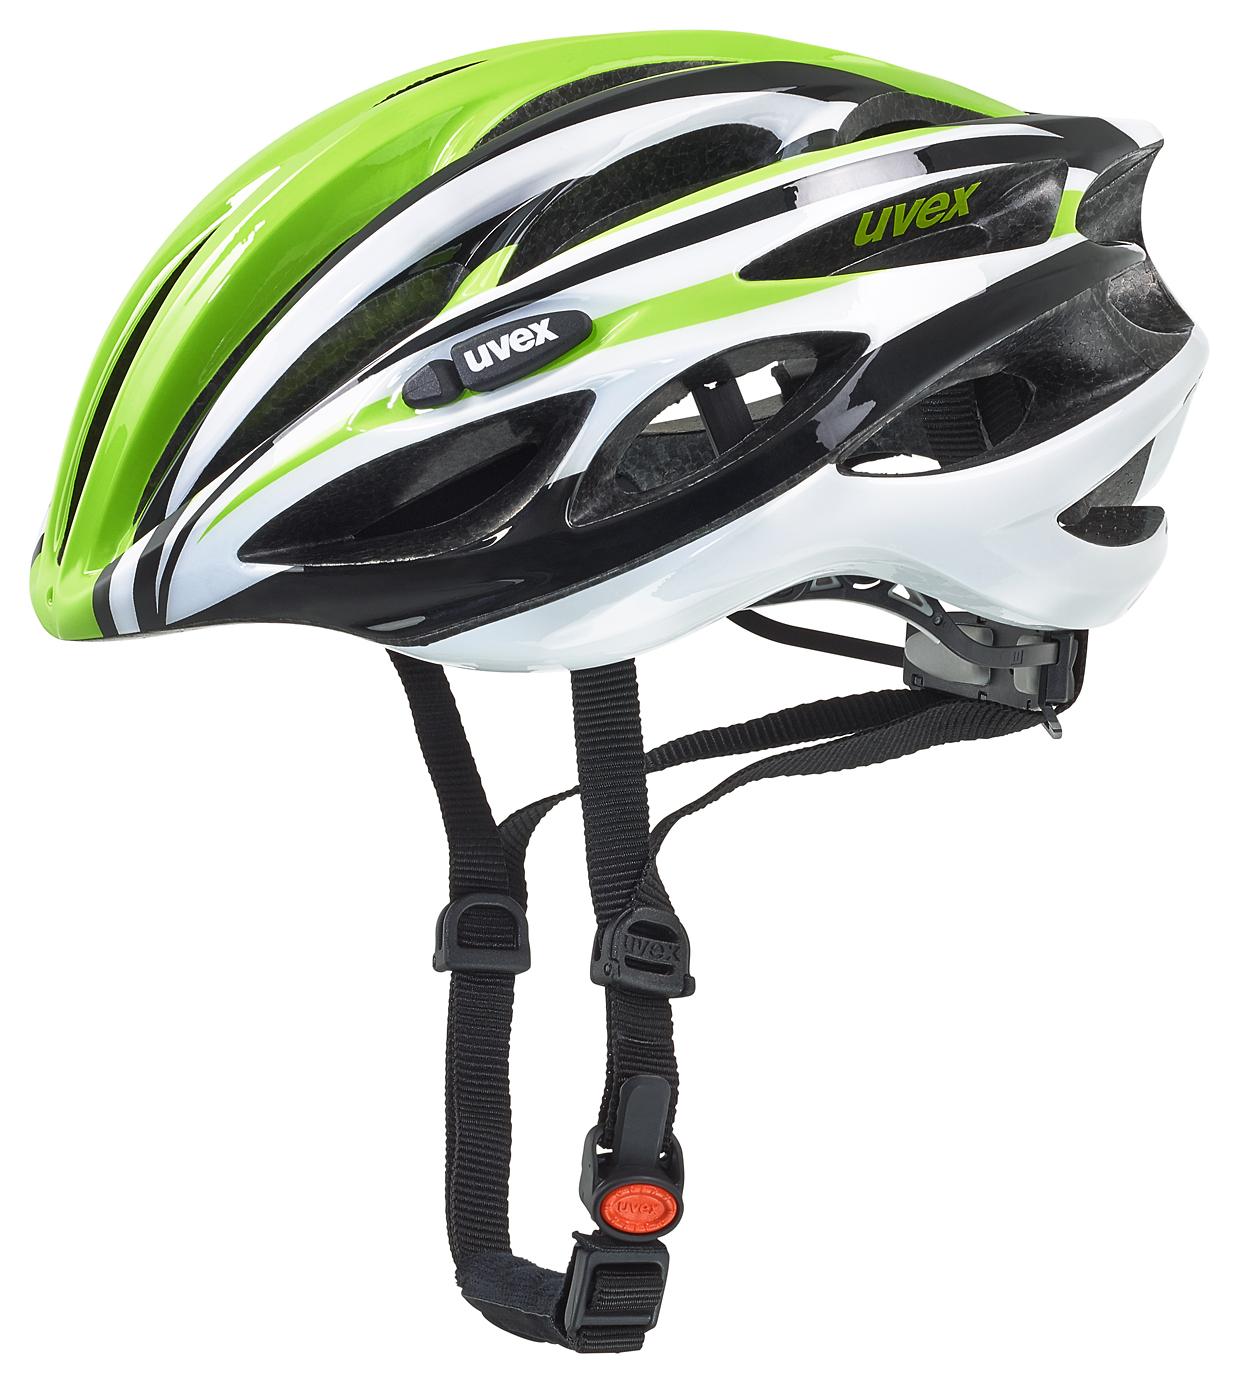 UVEX RACE 1, GREEN-WHITE 2016 50-55 cm